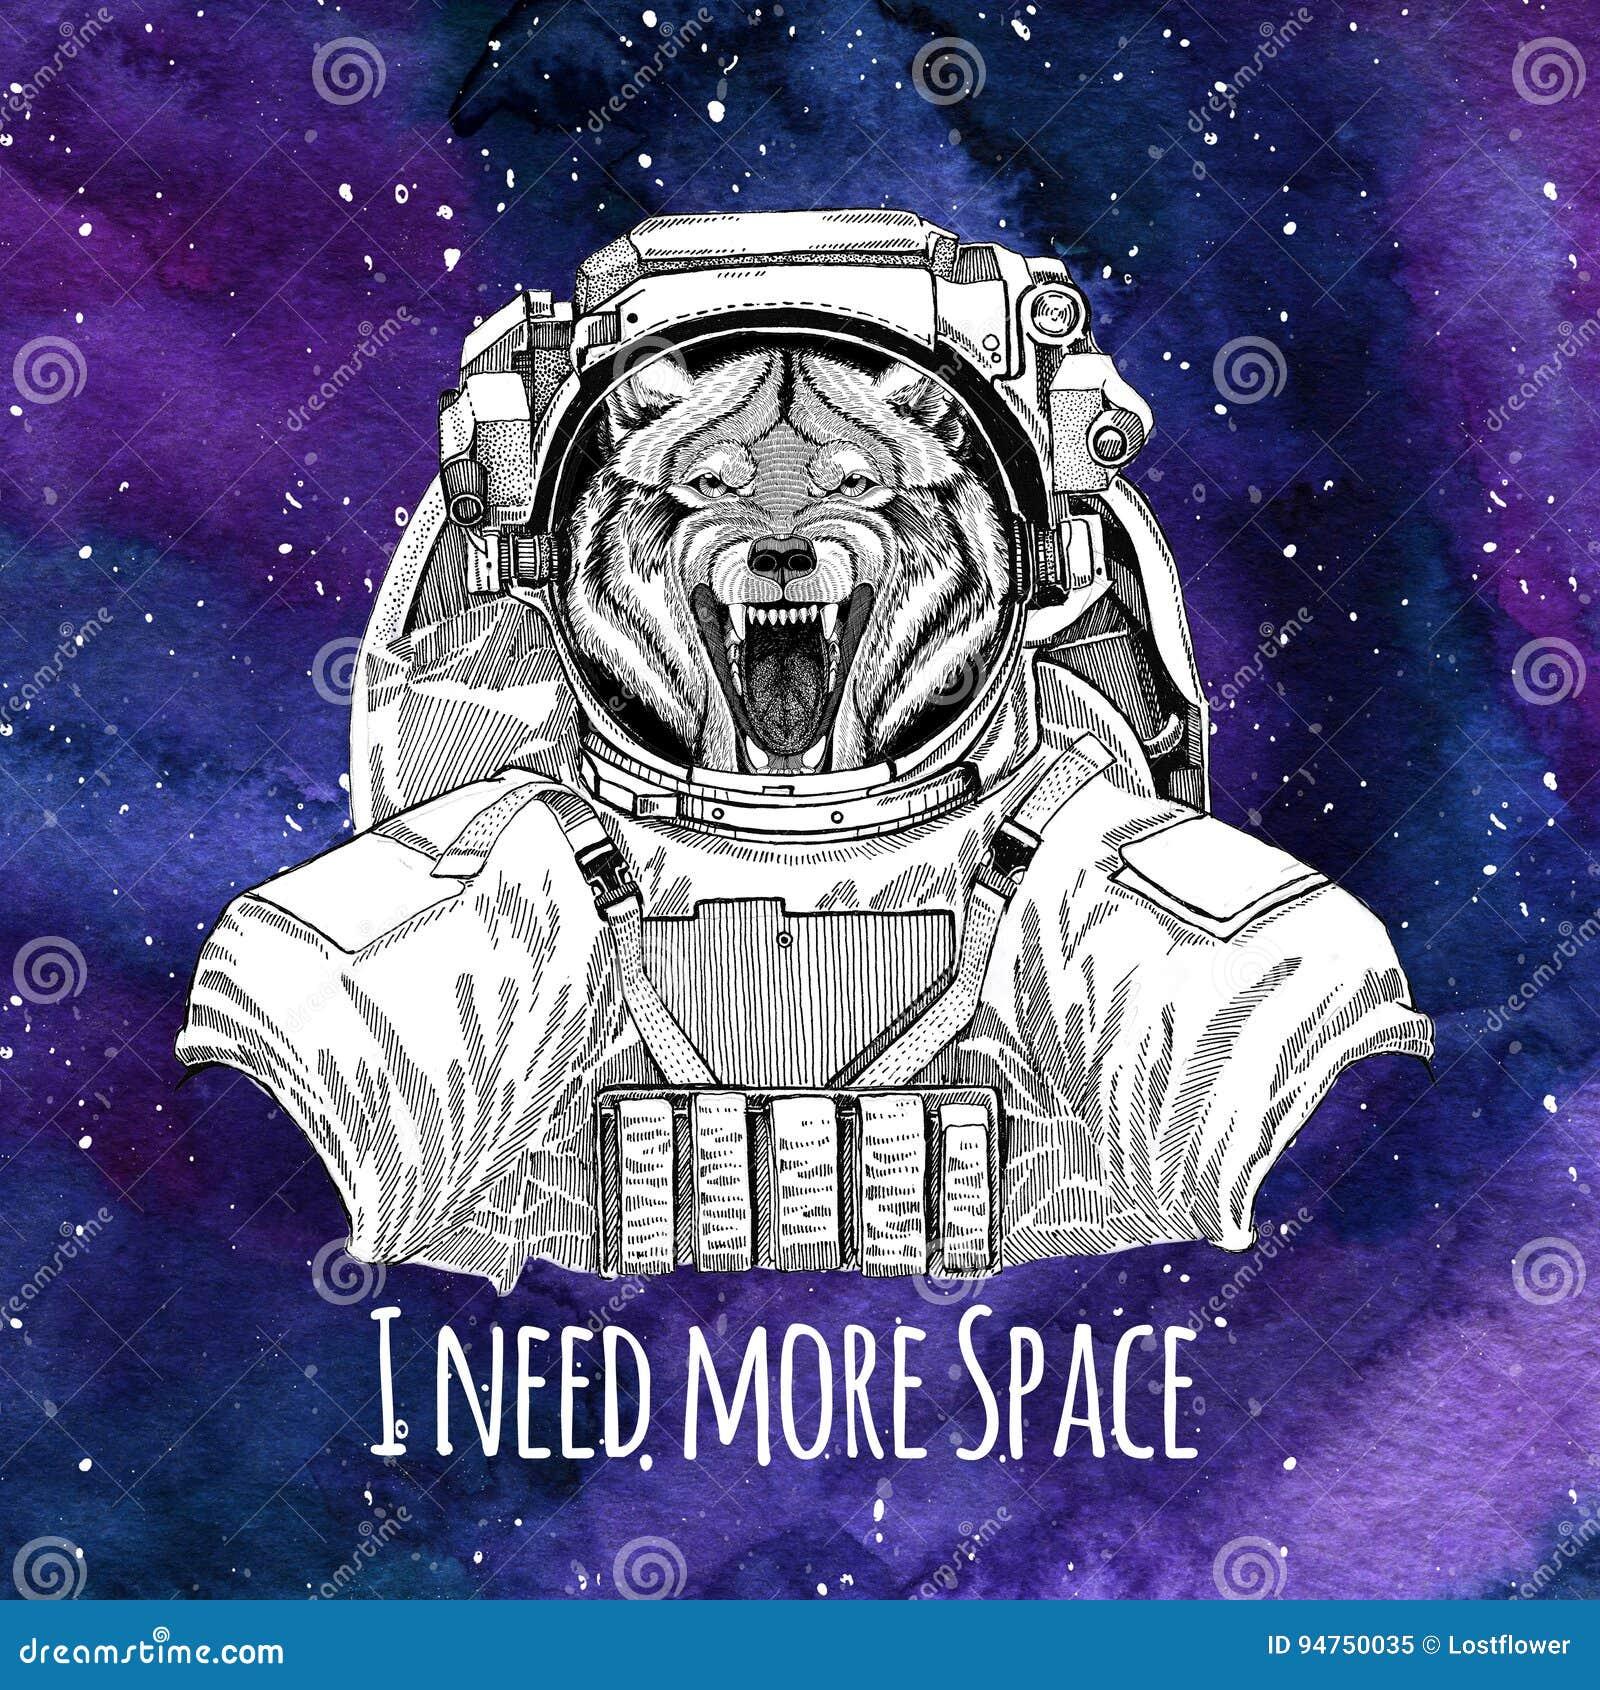 animal astronaut wolf dog wild animal wearing space suit galaxy space background stars nebula watercolor galaxy 94750035